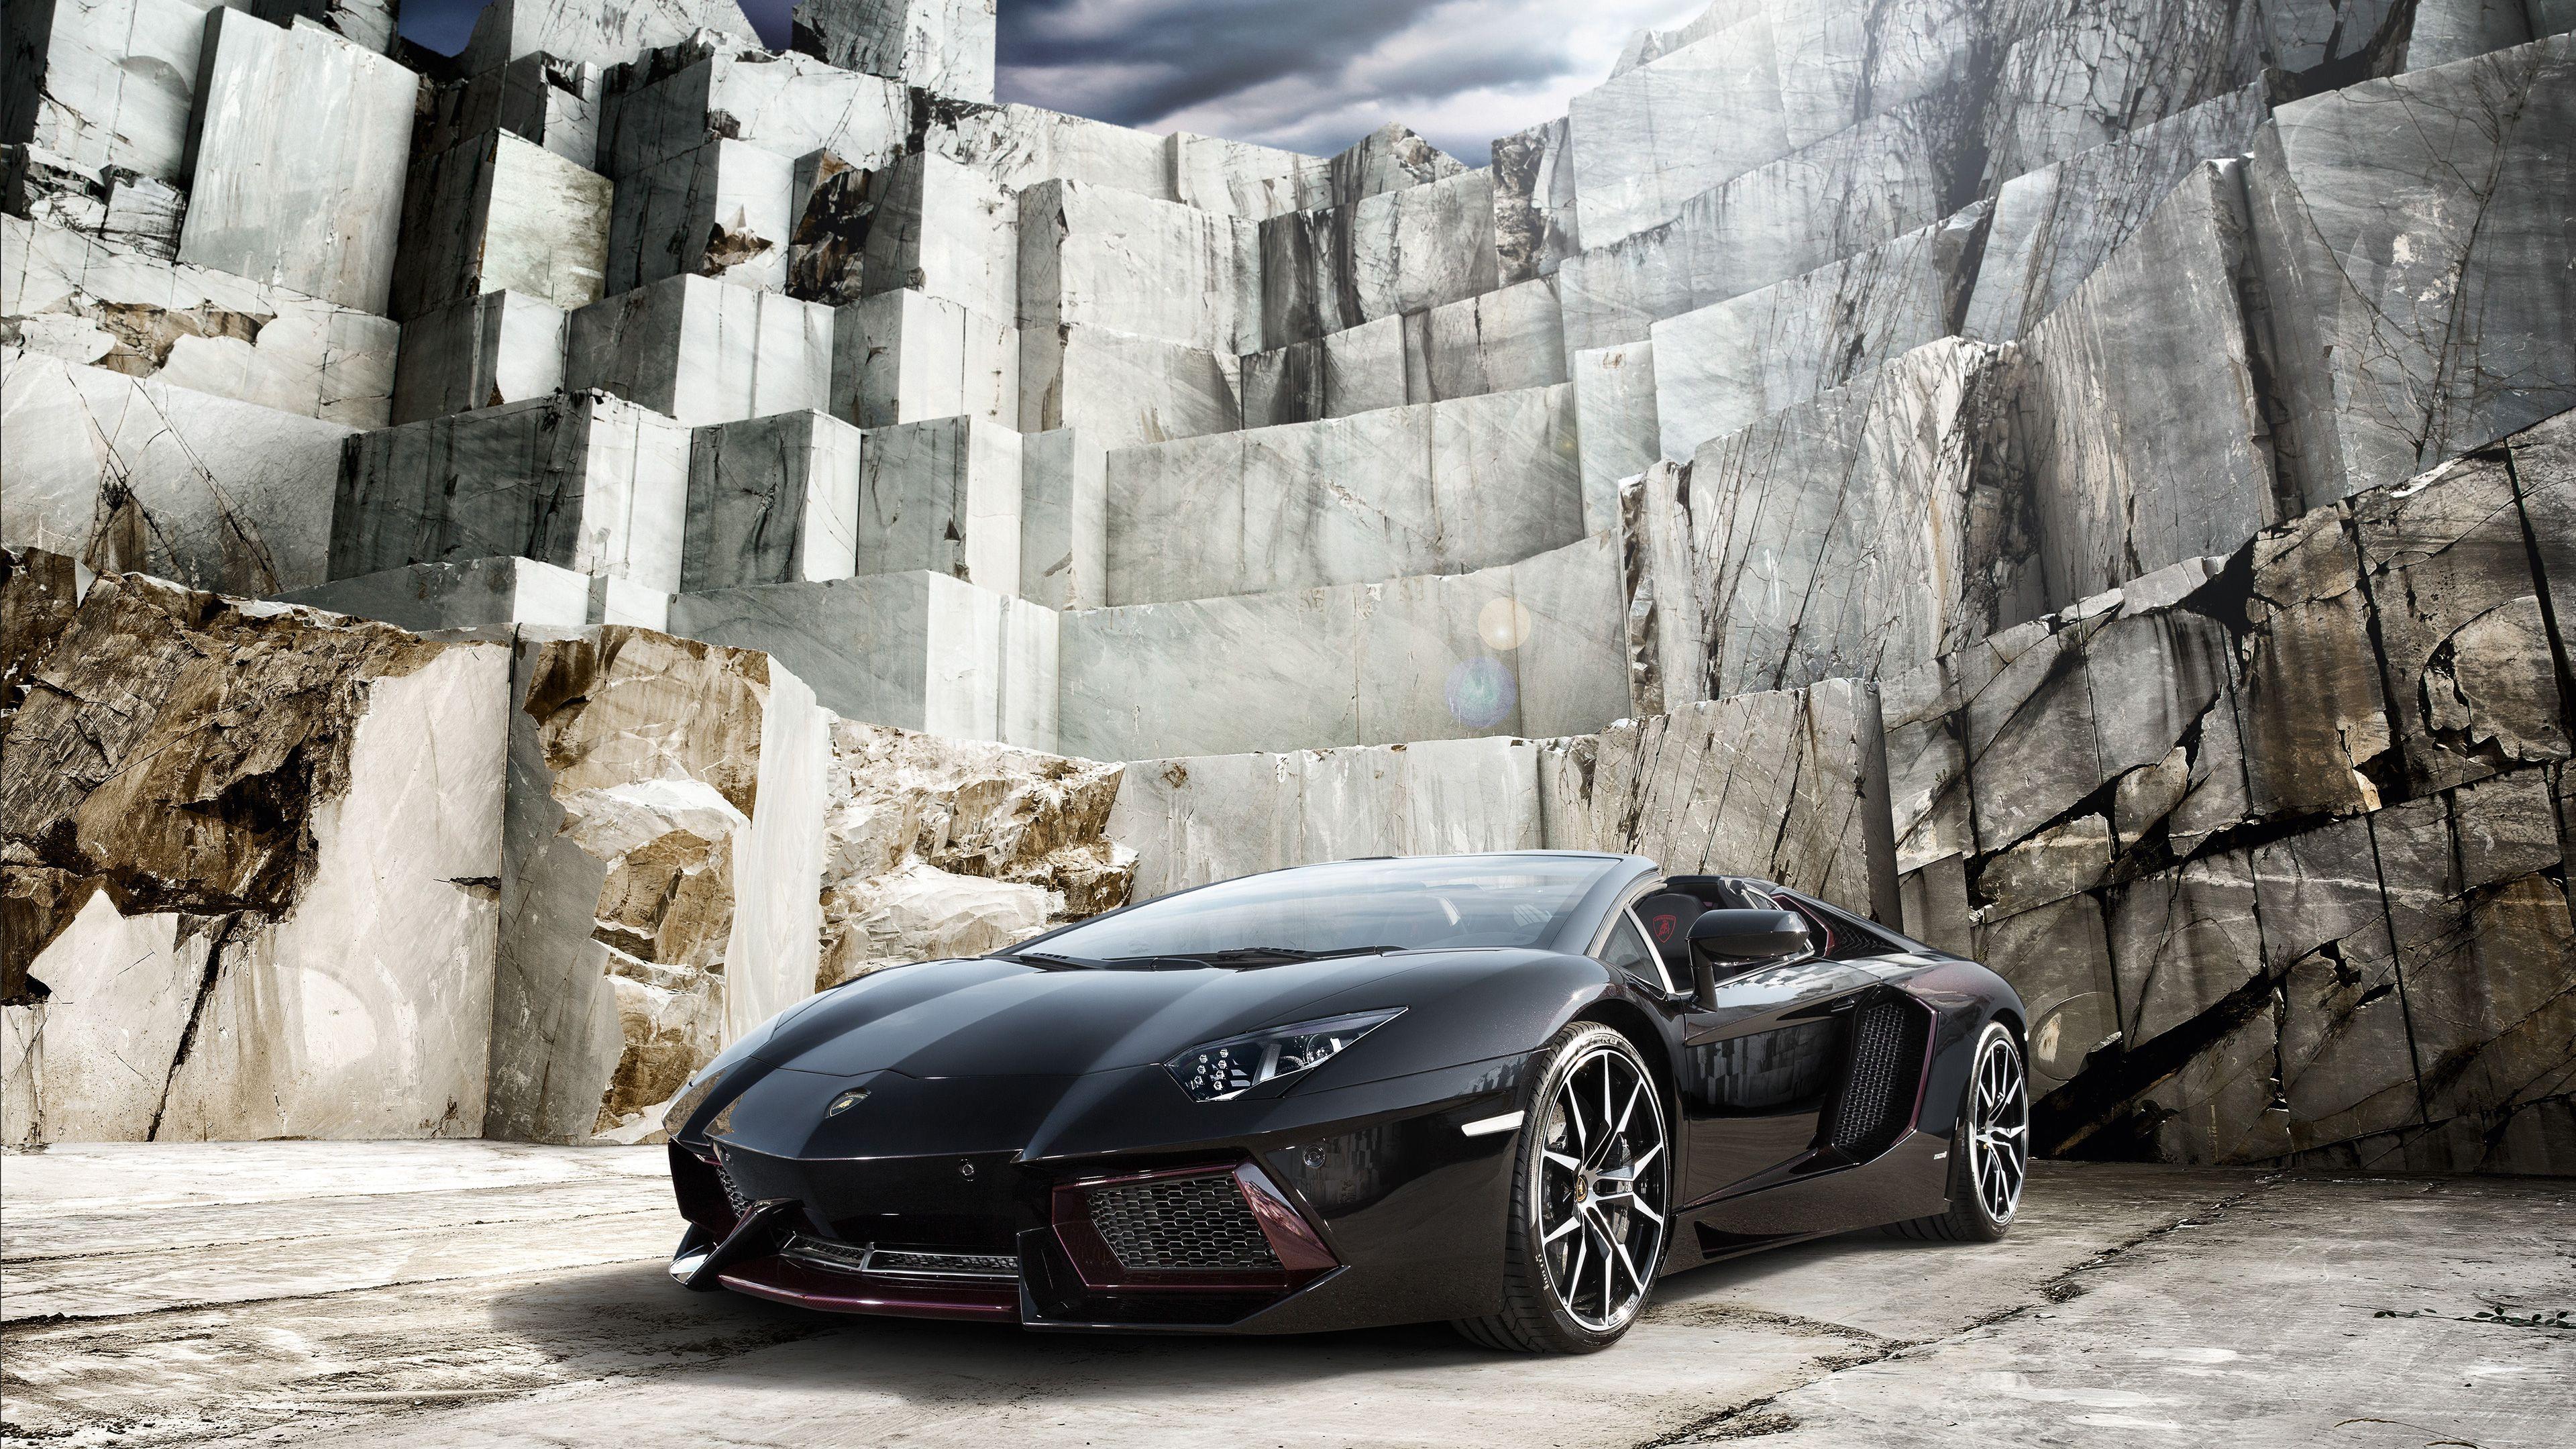 Black Lamborghini Aventador 4k Lamborghini Wallpapers Lamborghini Aventador Wallpapers H Lamborghini Aventador Lamborghini Aventador Wallpaper Car Wallpapers